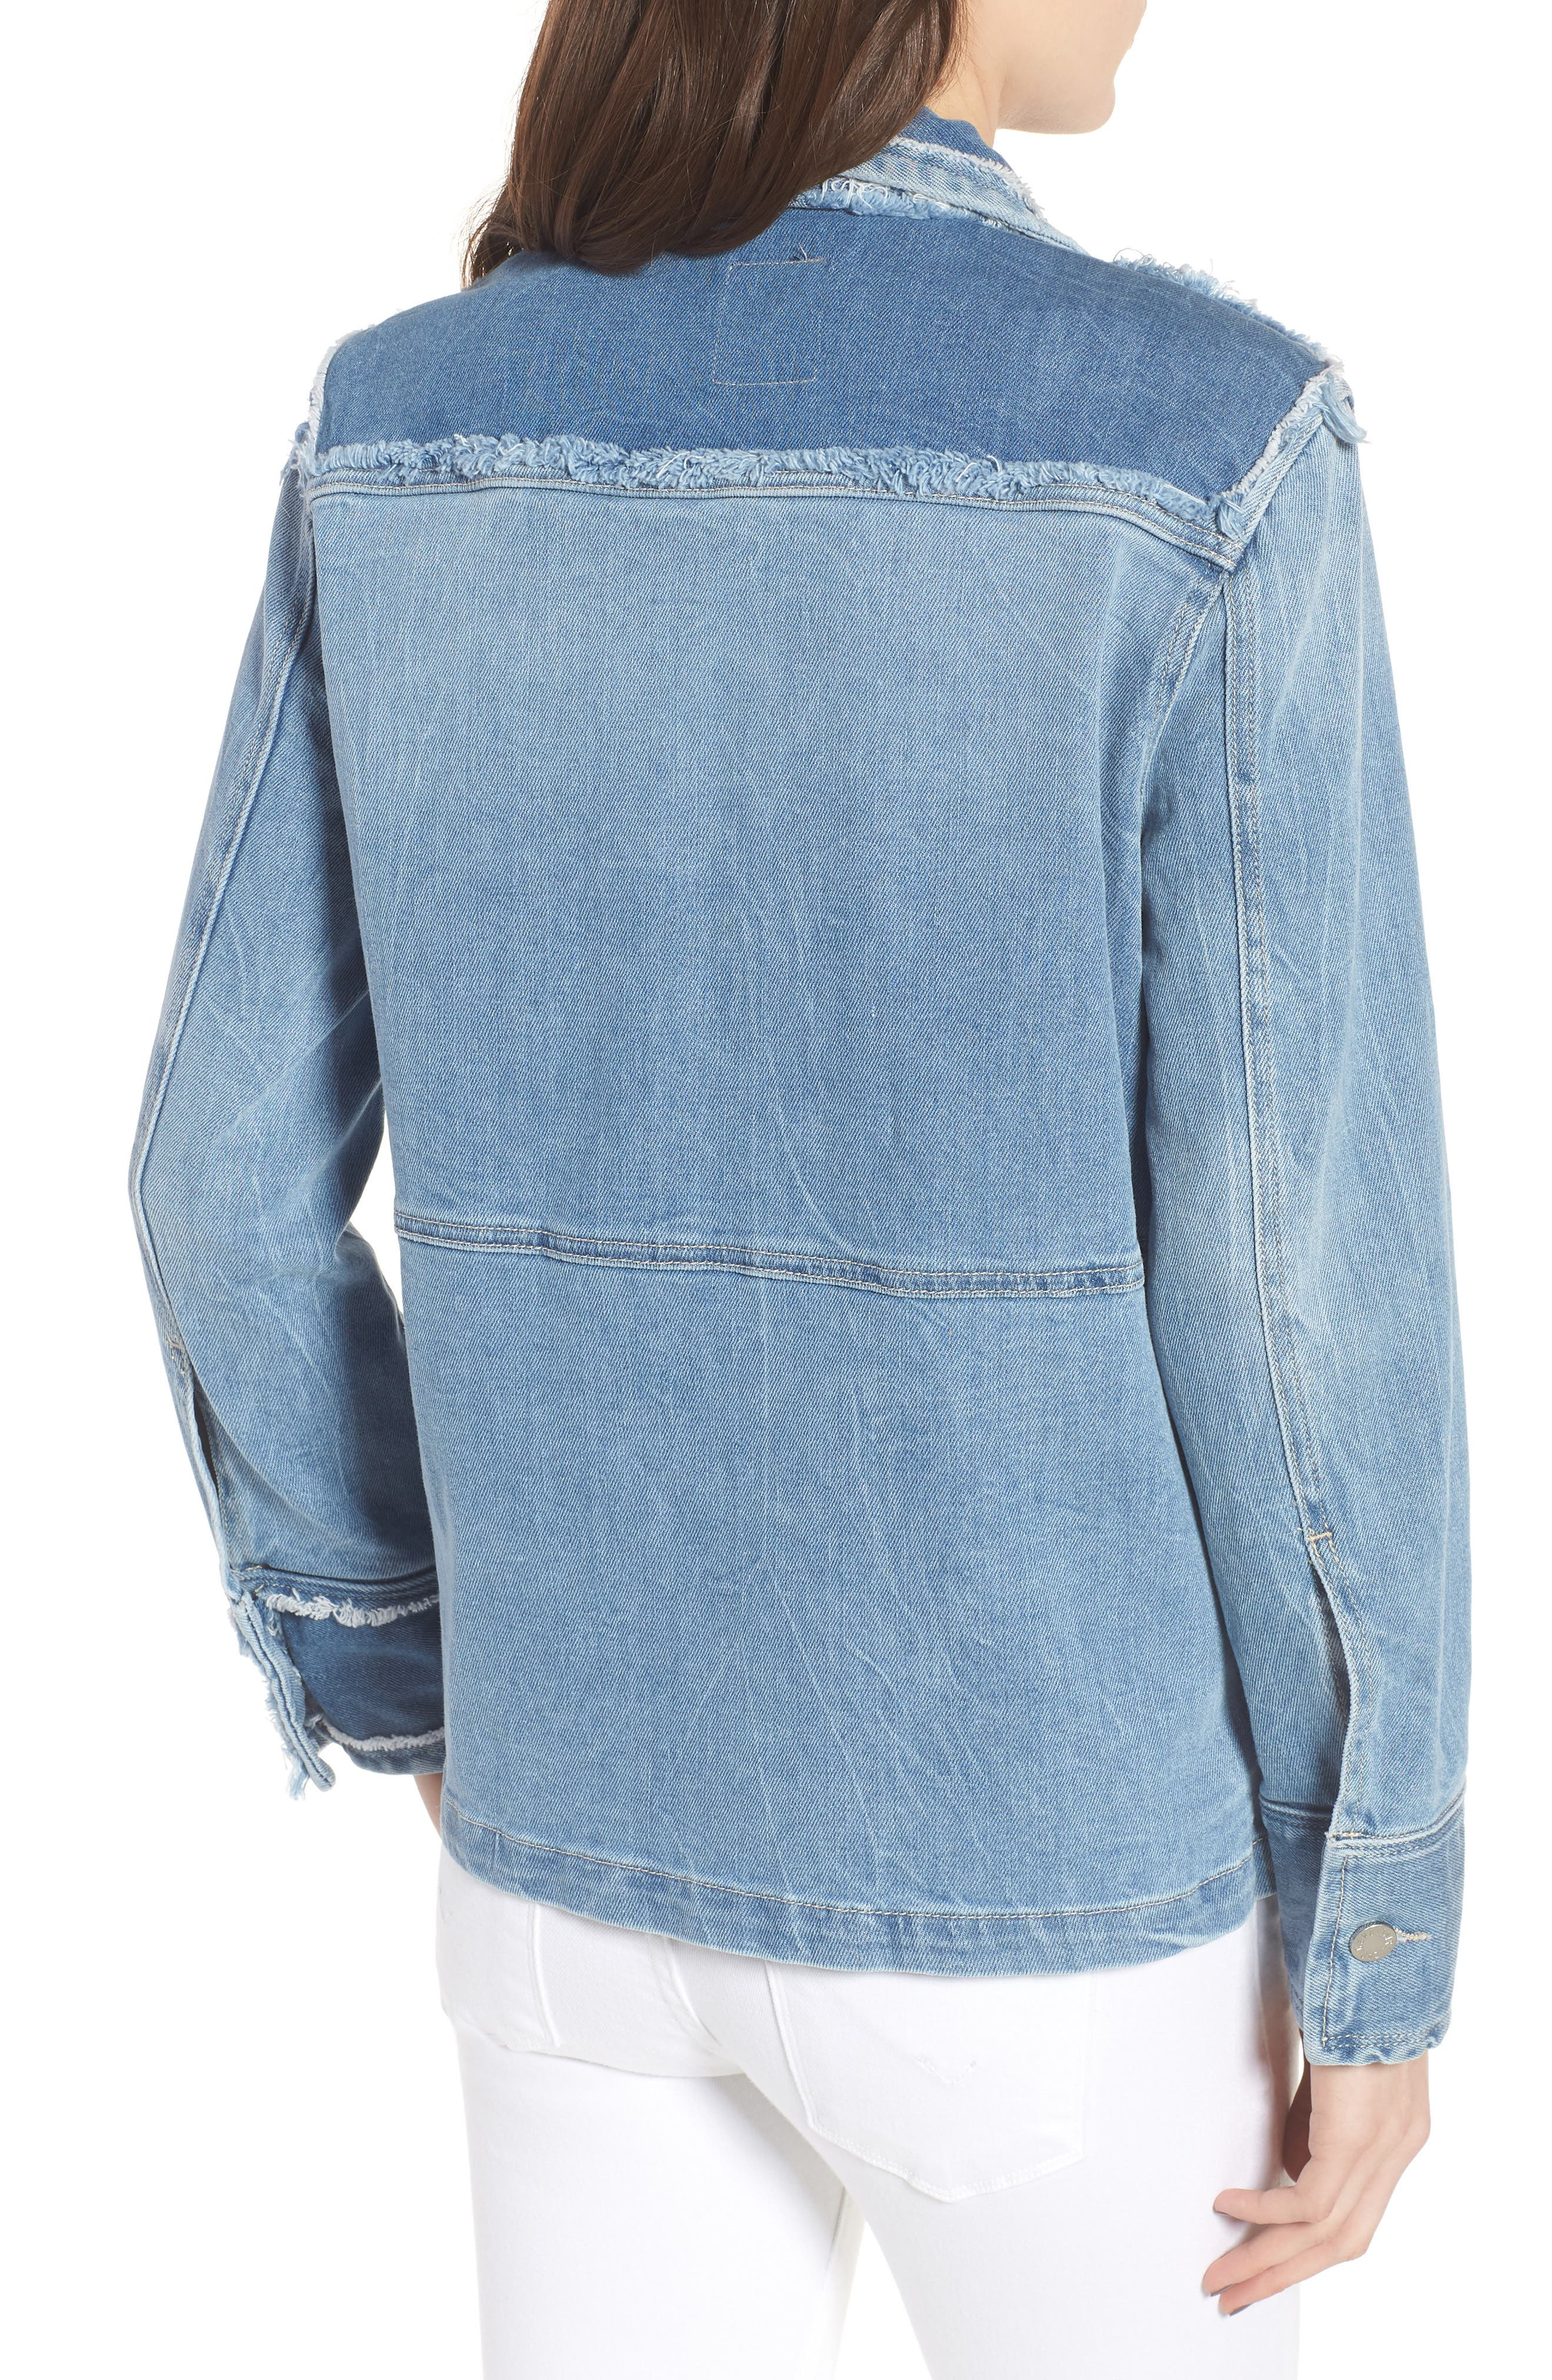 Kick Destroy Deconstructed Denim Jacket,                             Alternate thumbnail 2, color,                             Bleu